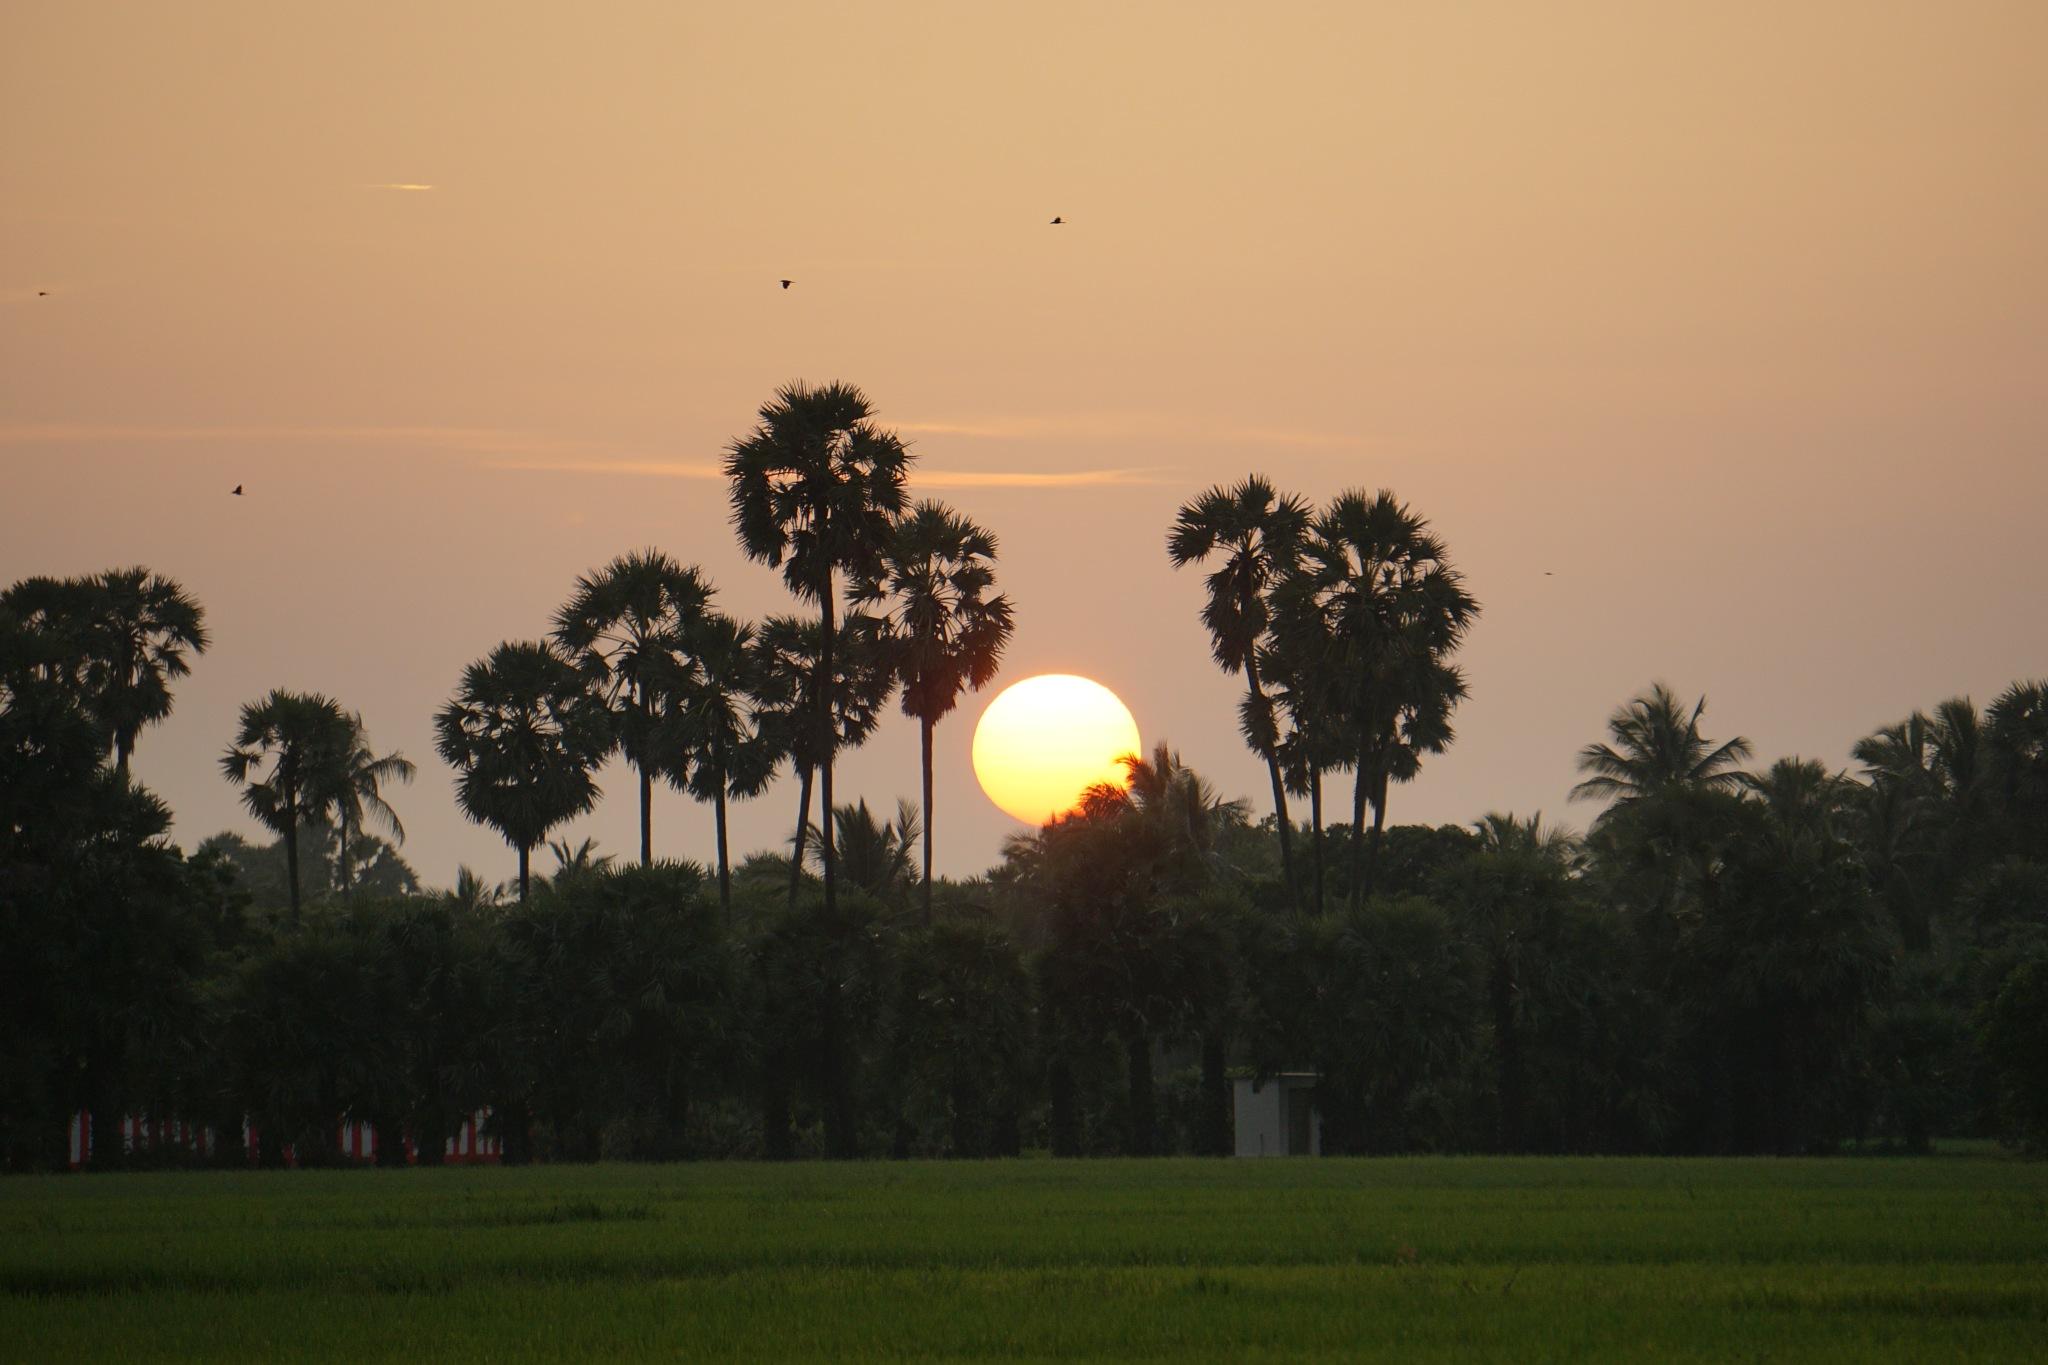 Sunsets by Prageeth Wanigasekara